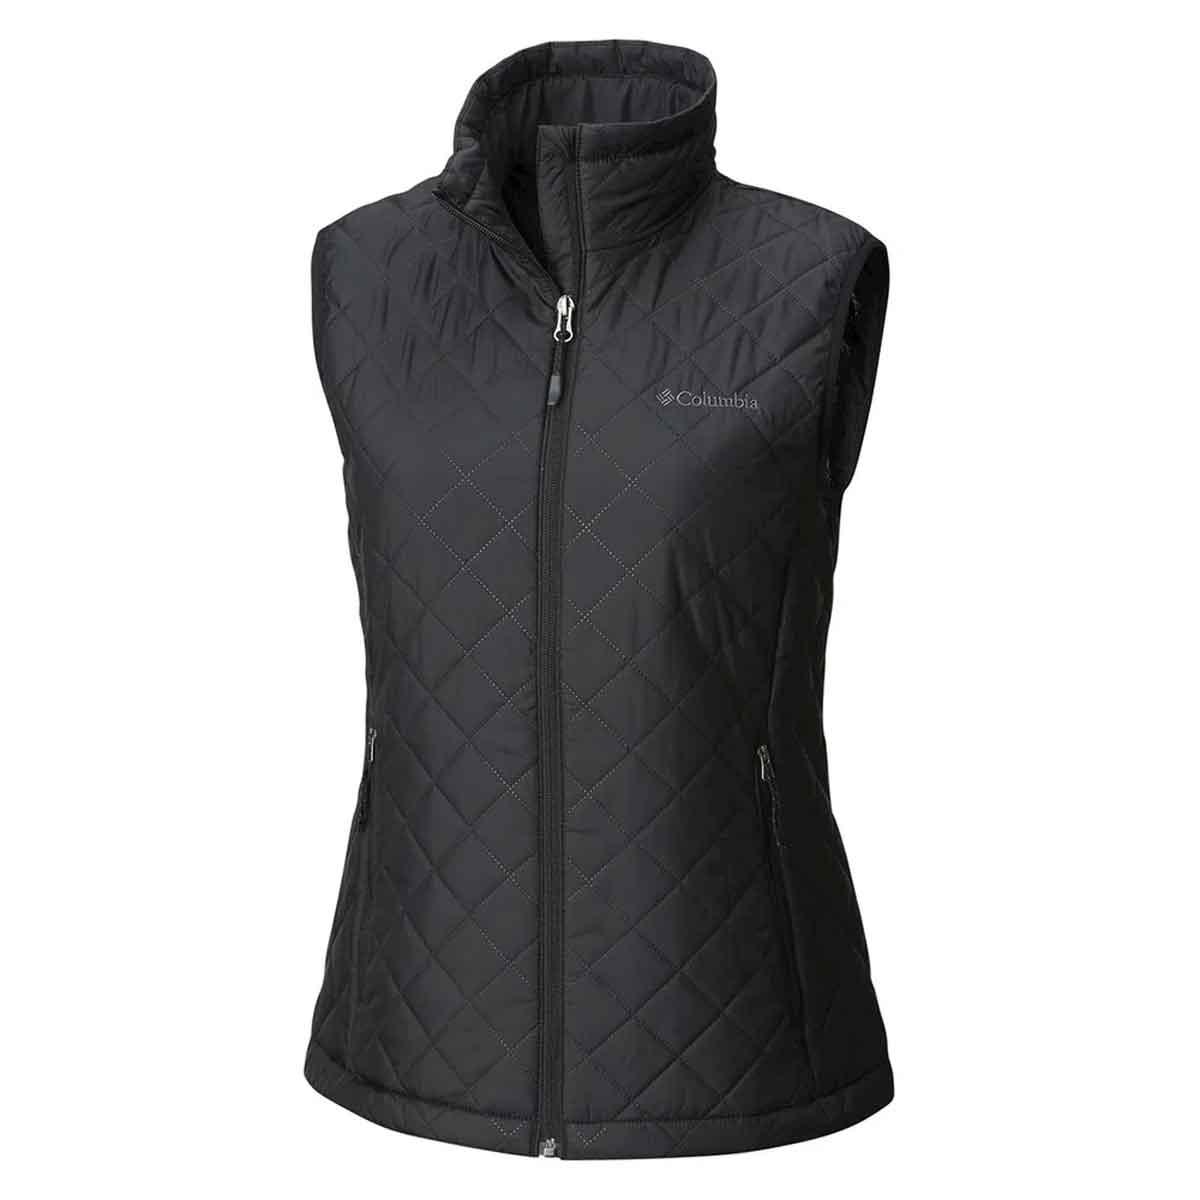 Colete Columbia Dualistic Vest Light Black